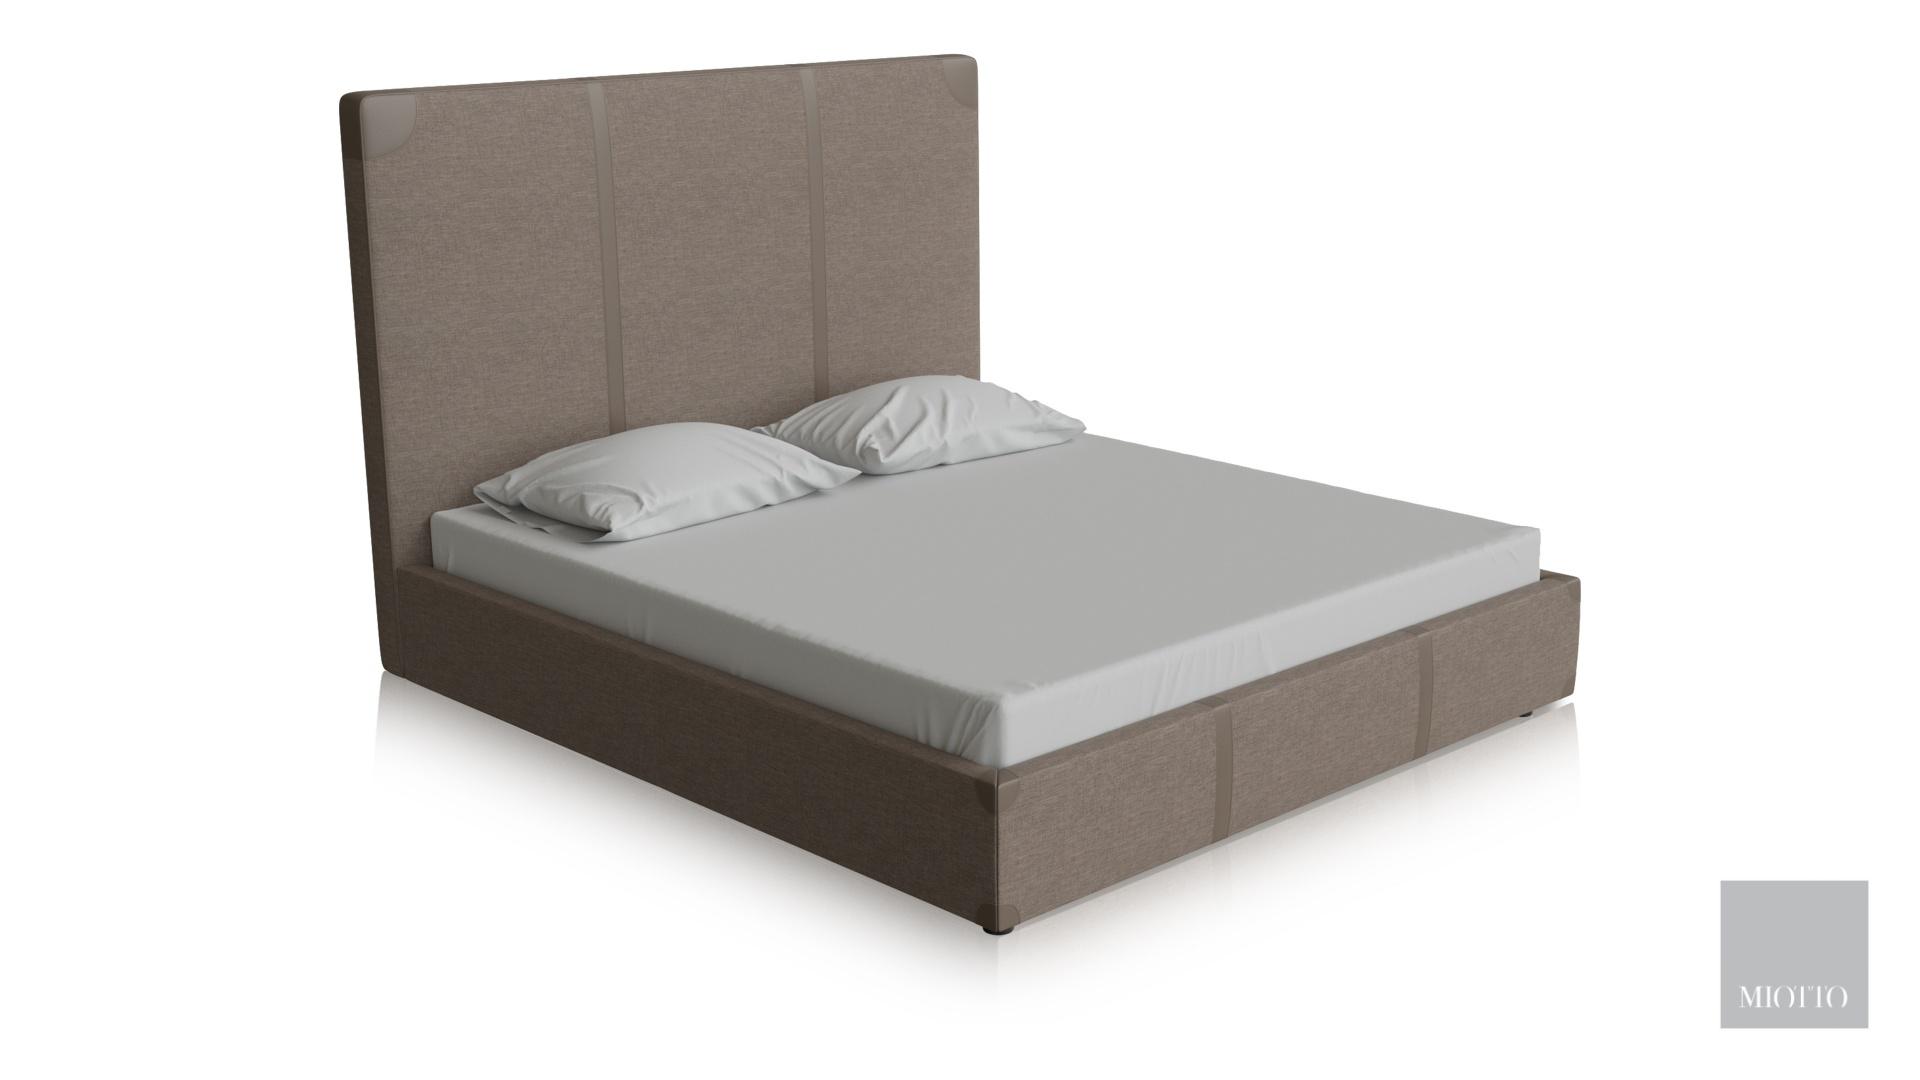 miotto_bolgheri bed brown